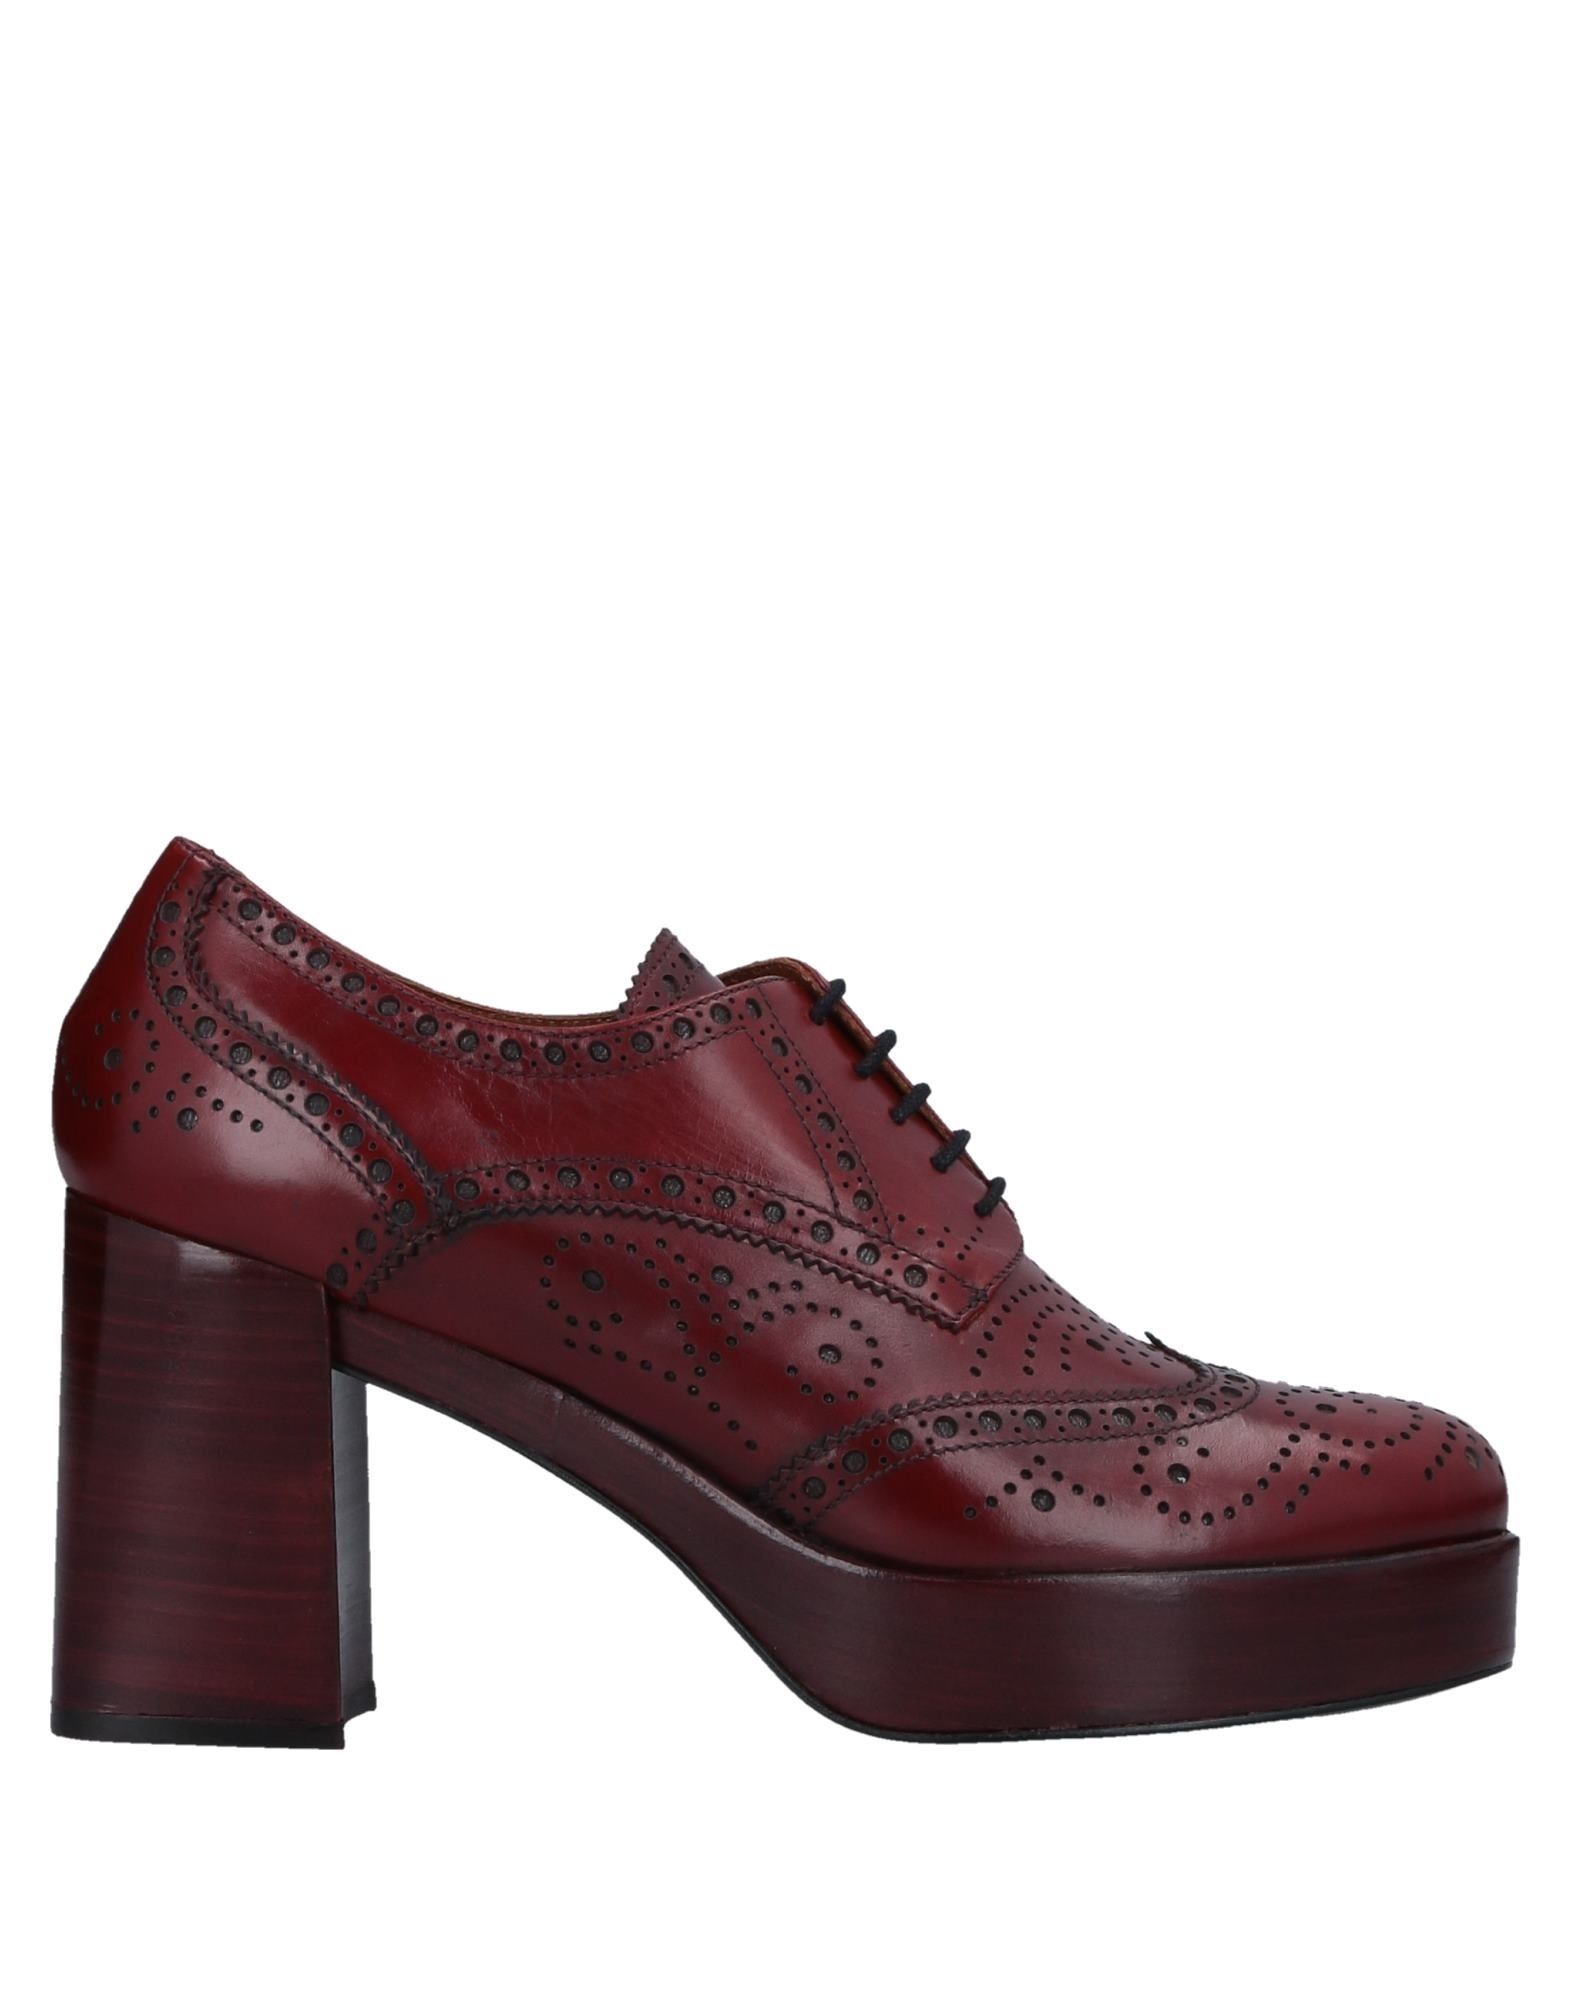 Stilvolle billige Schuhe Pons 11519406QT Quintana Schnürschuhe Damen  11519406QT Pons 91acbc